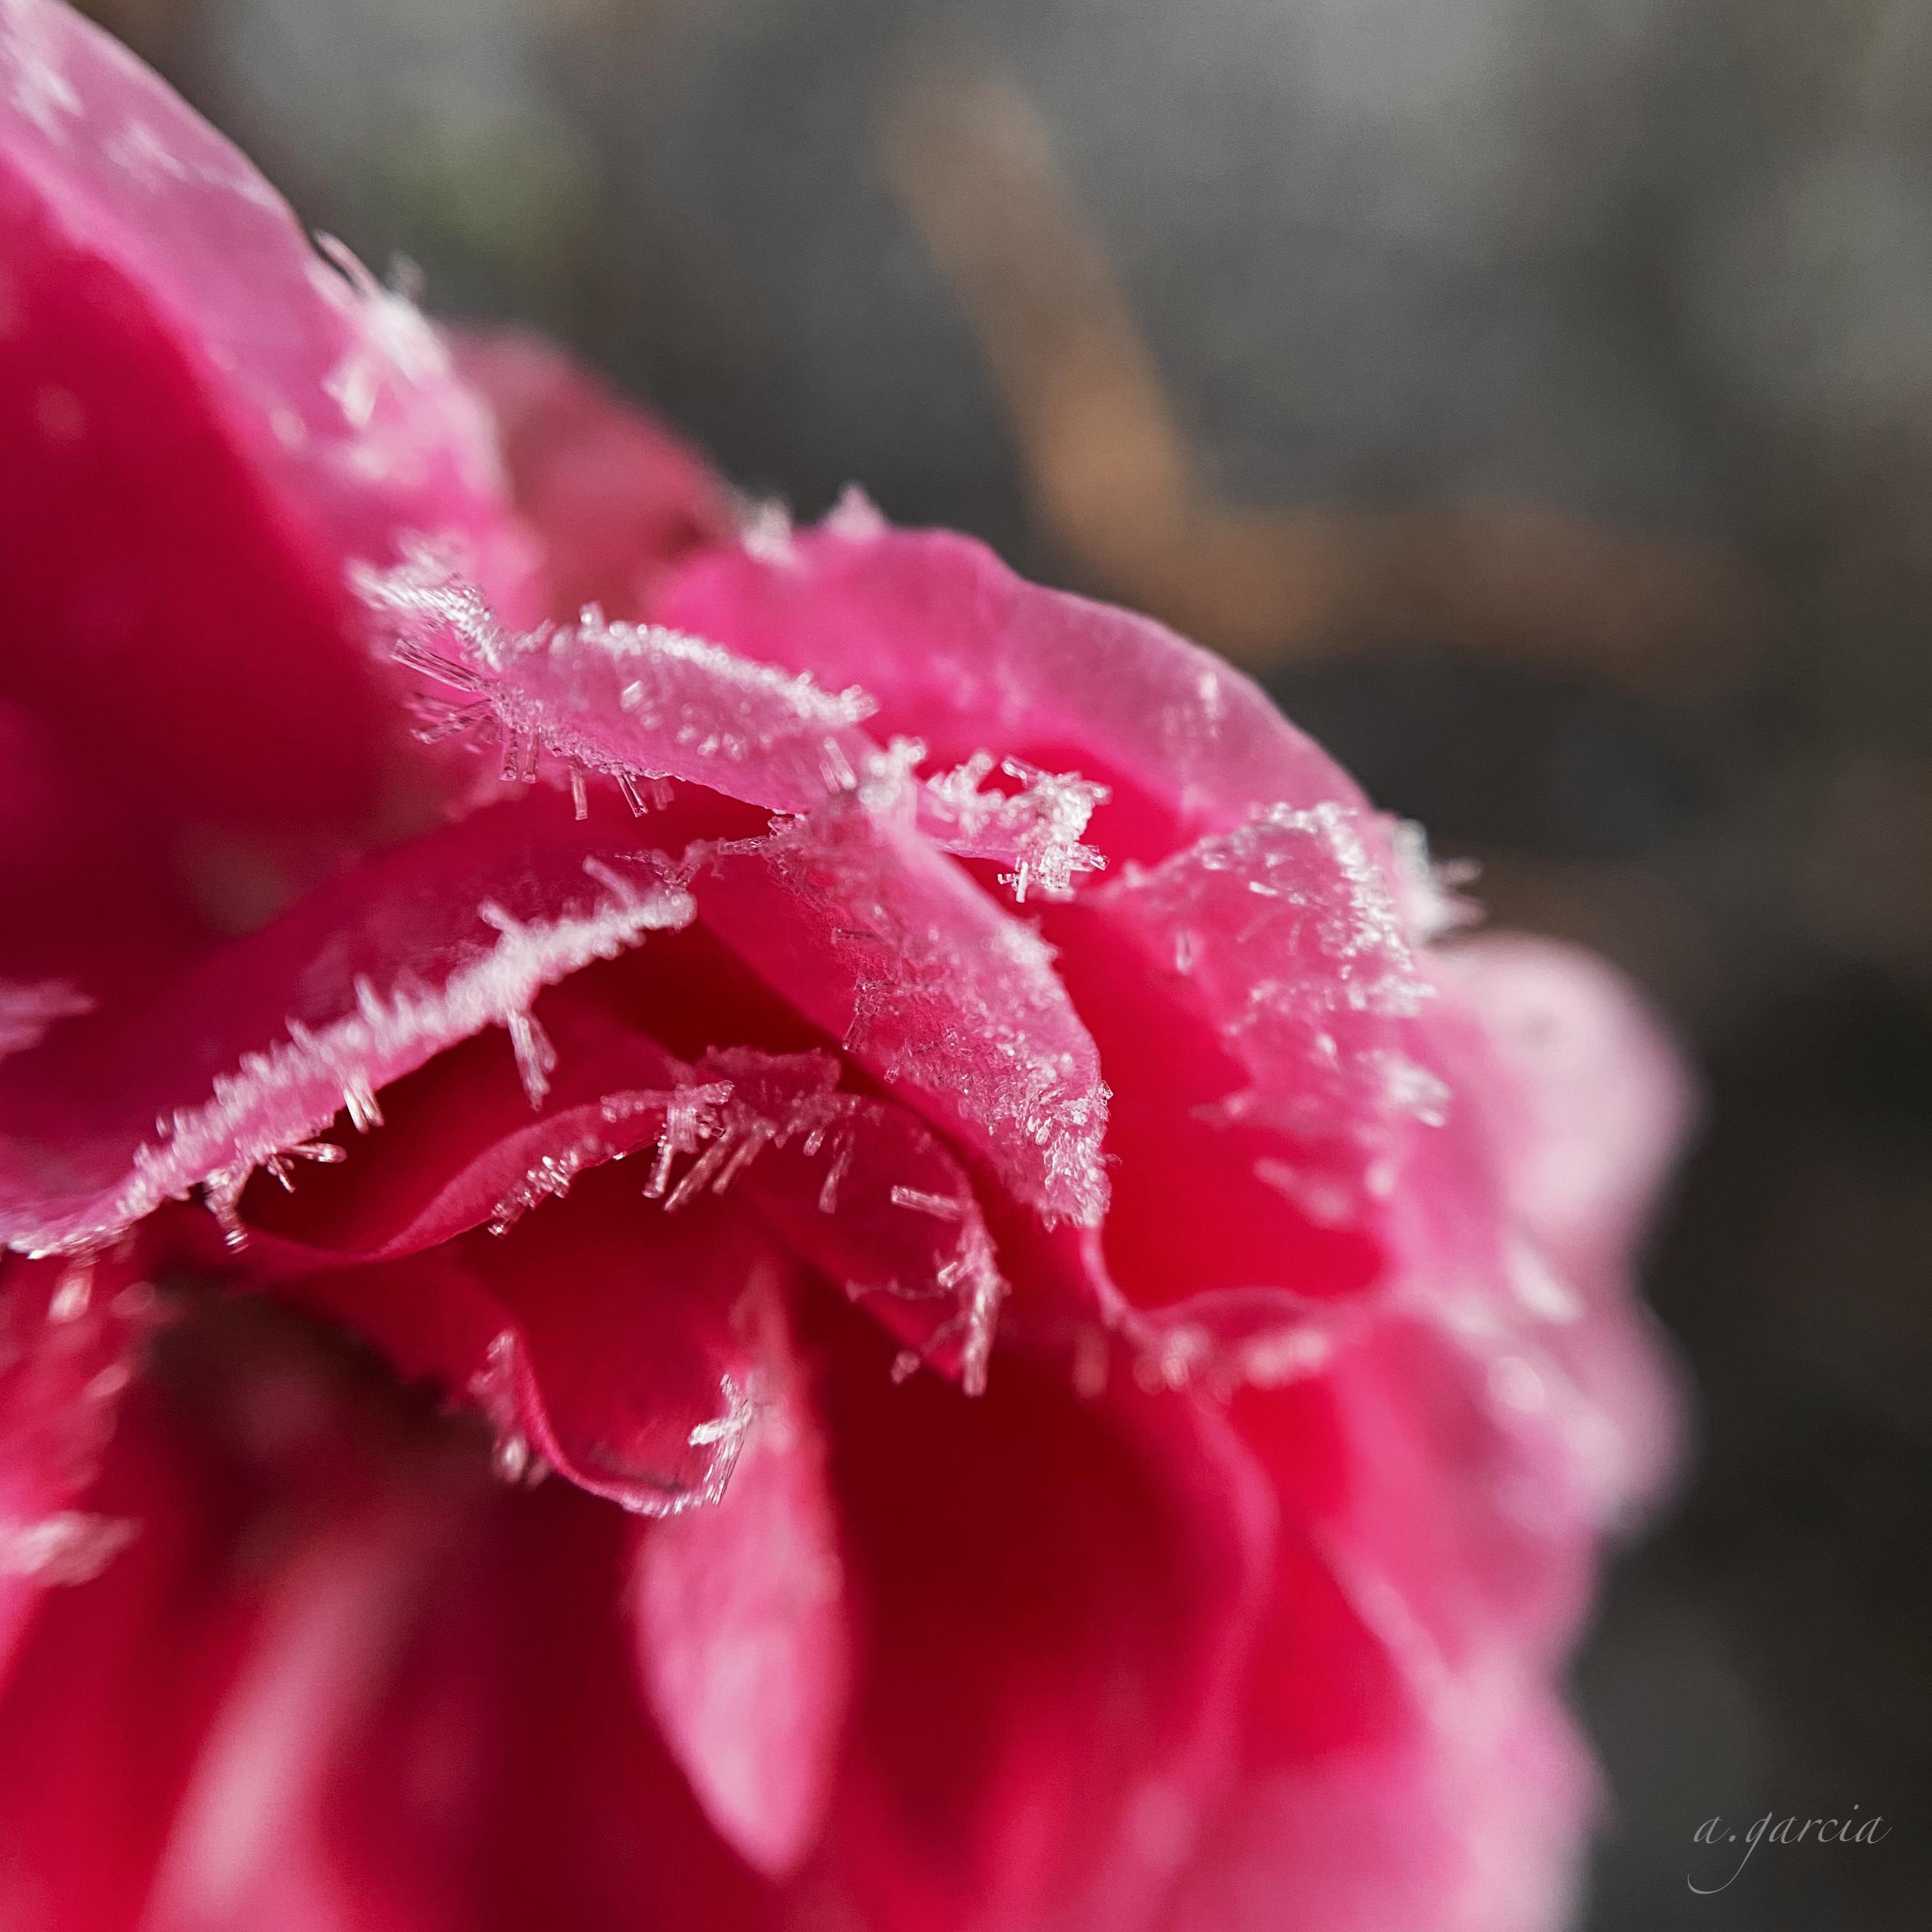 A frosty Little Mischief rose